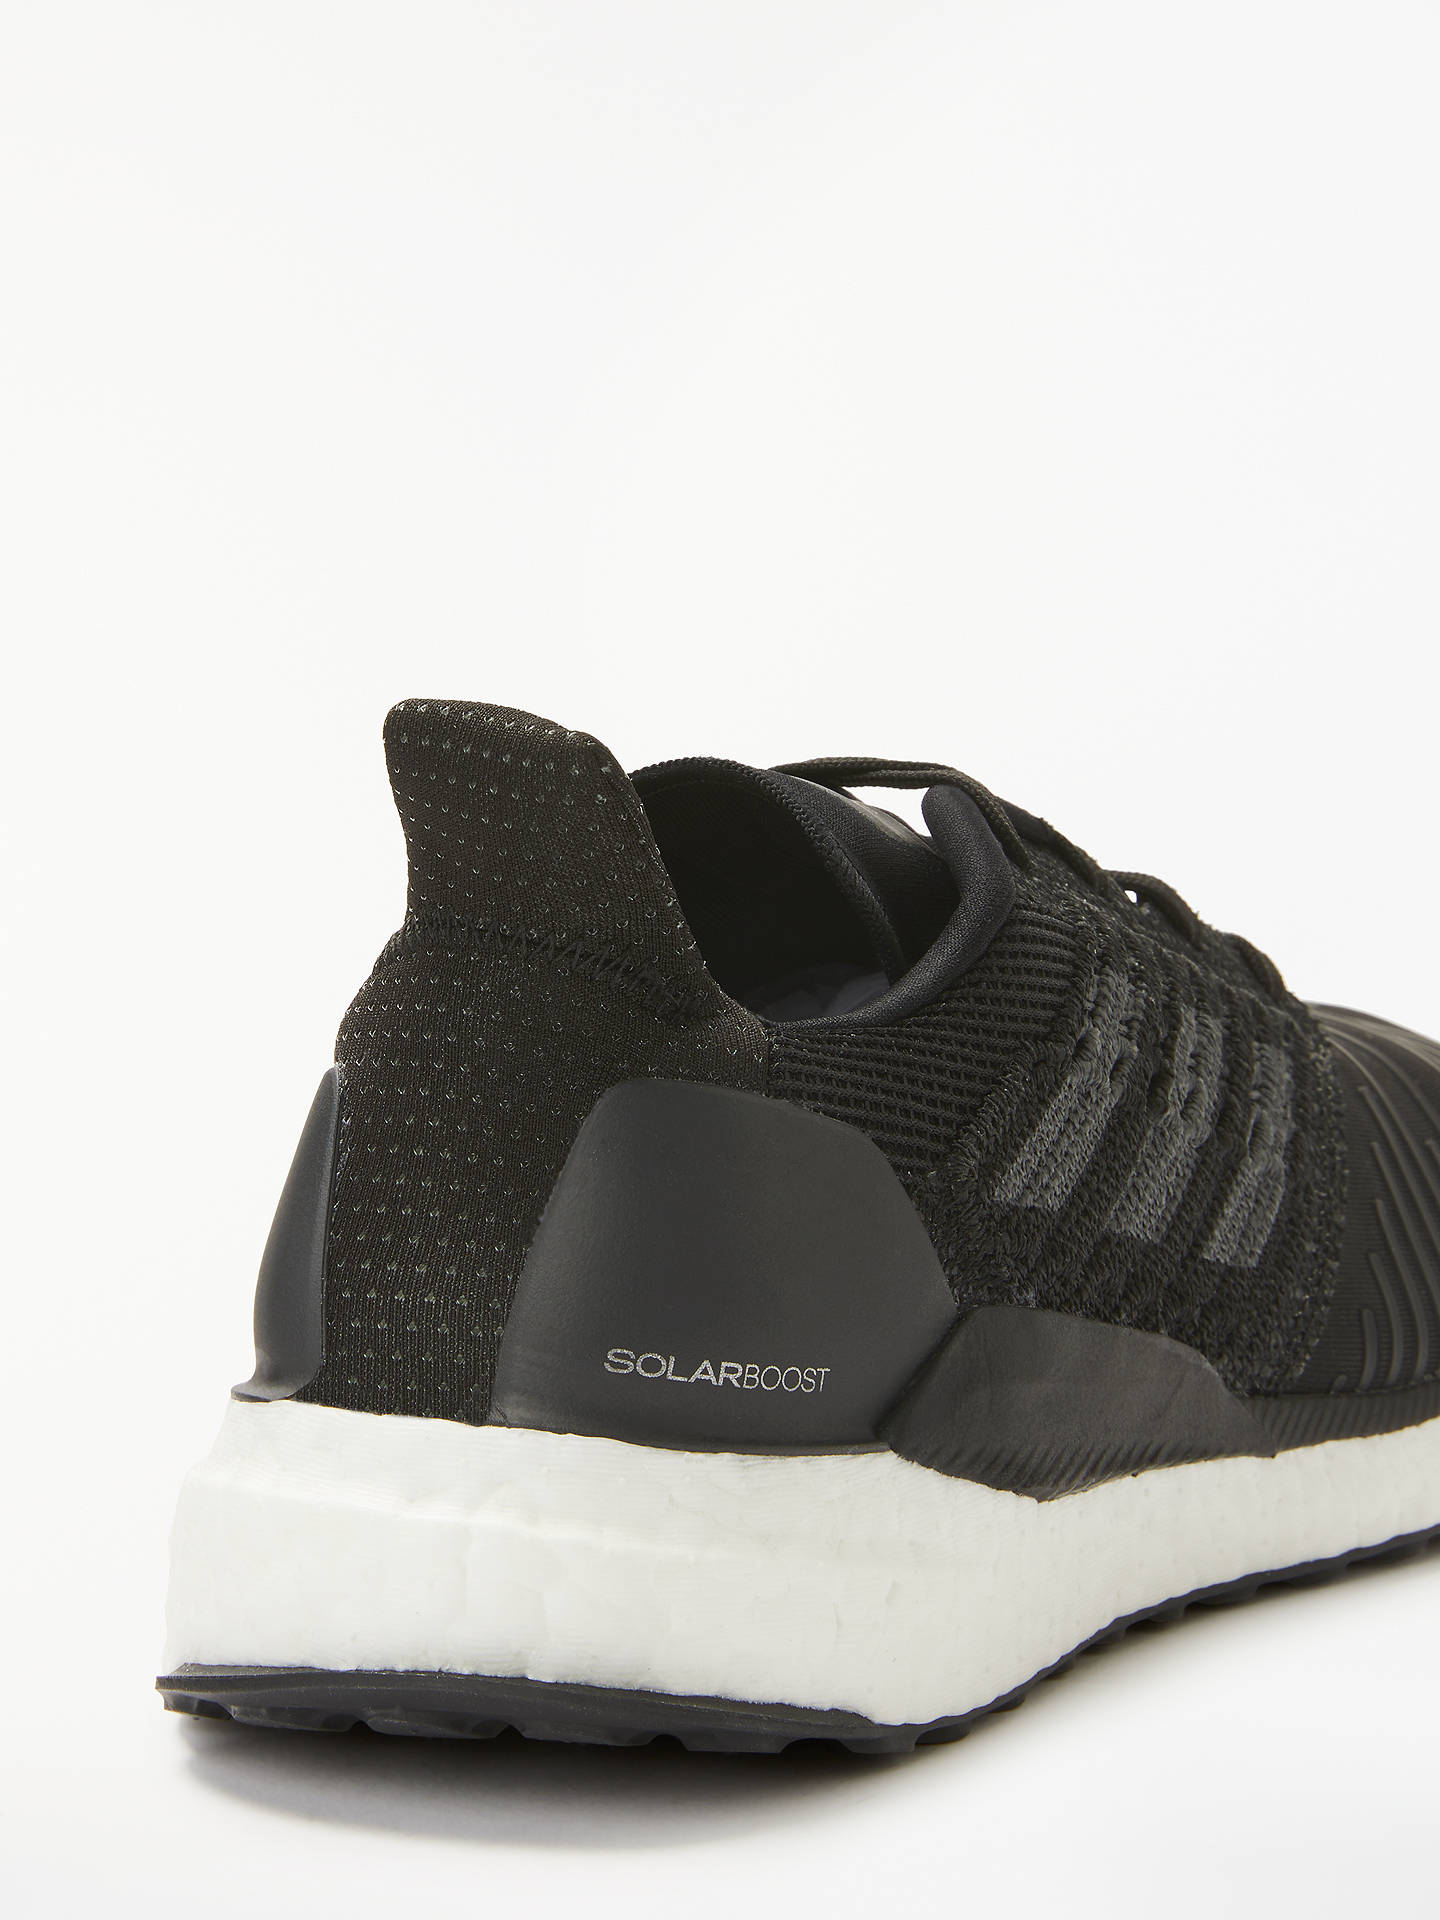 2e59a7e0e adidas Solar Boost Women s Running Shoes at John Lewis   Partners